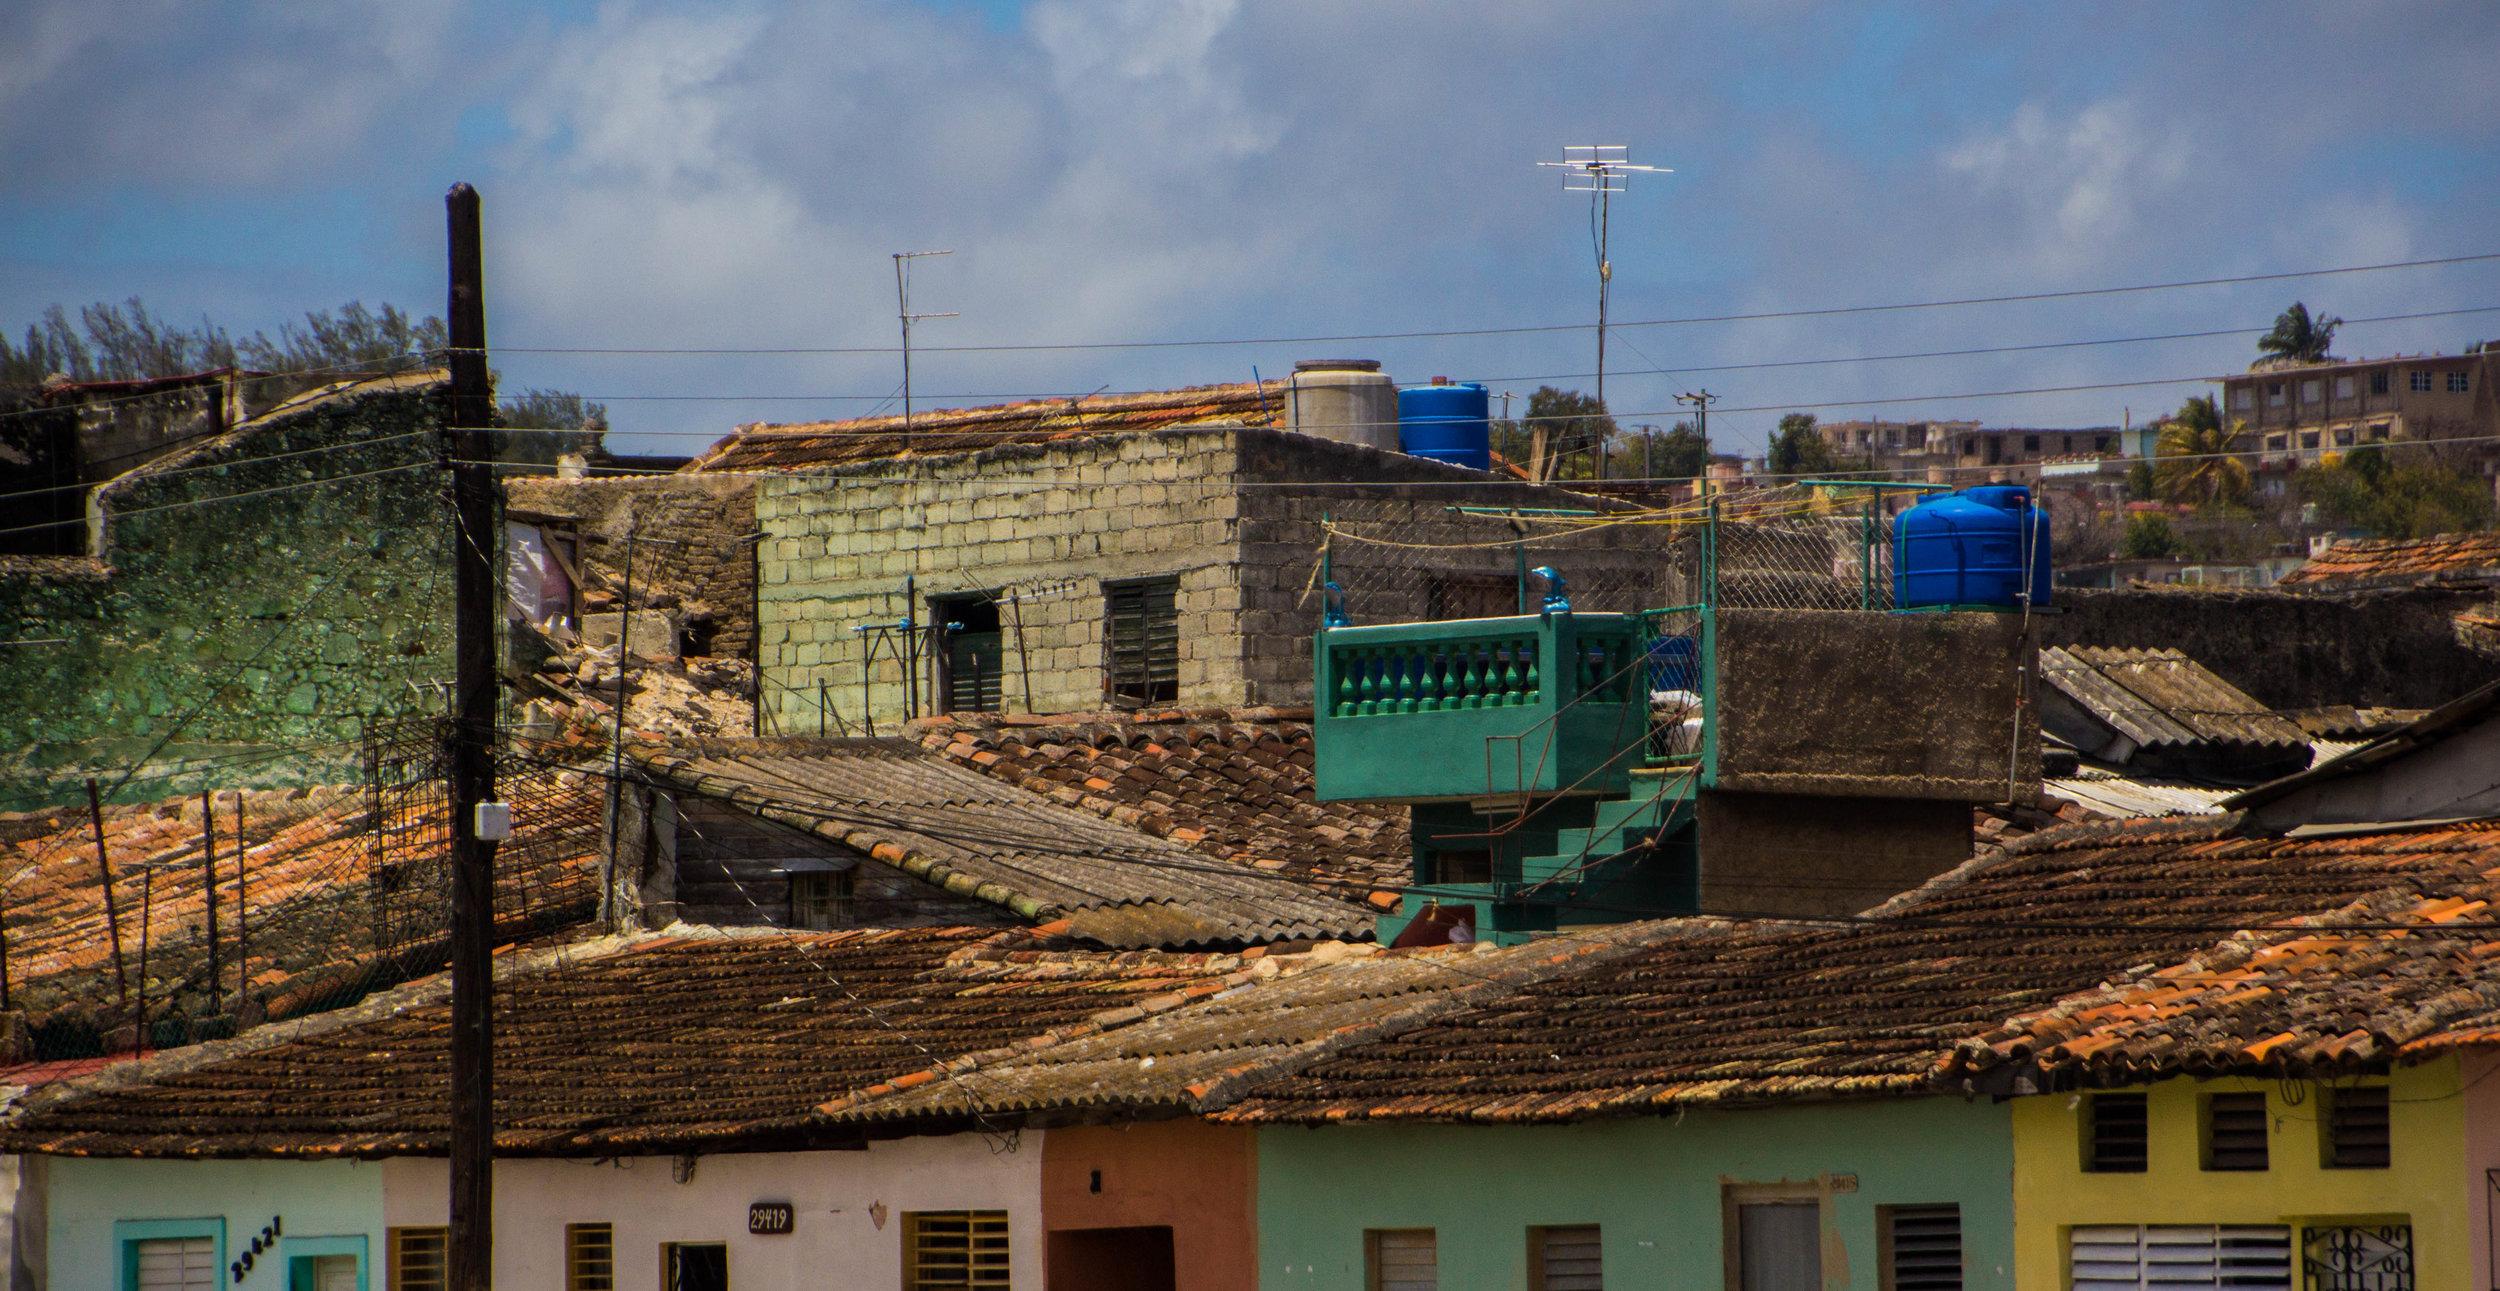 matanzas cuba city roofs-1-2.jpg